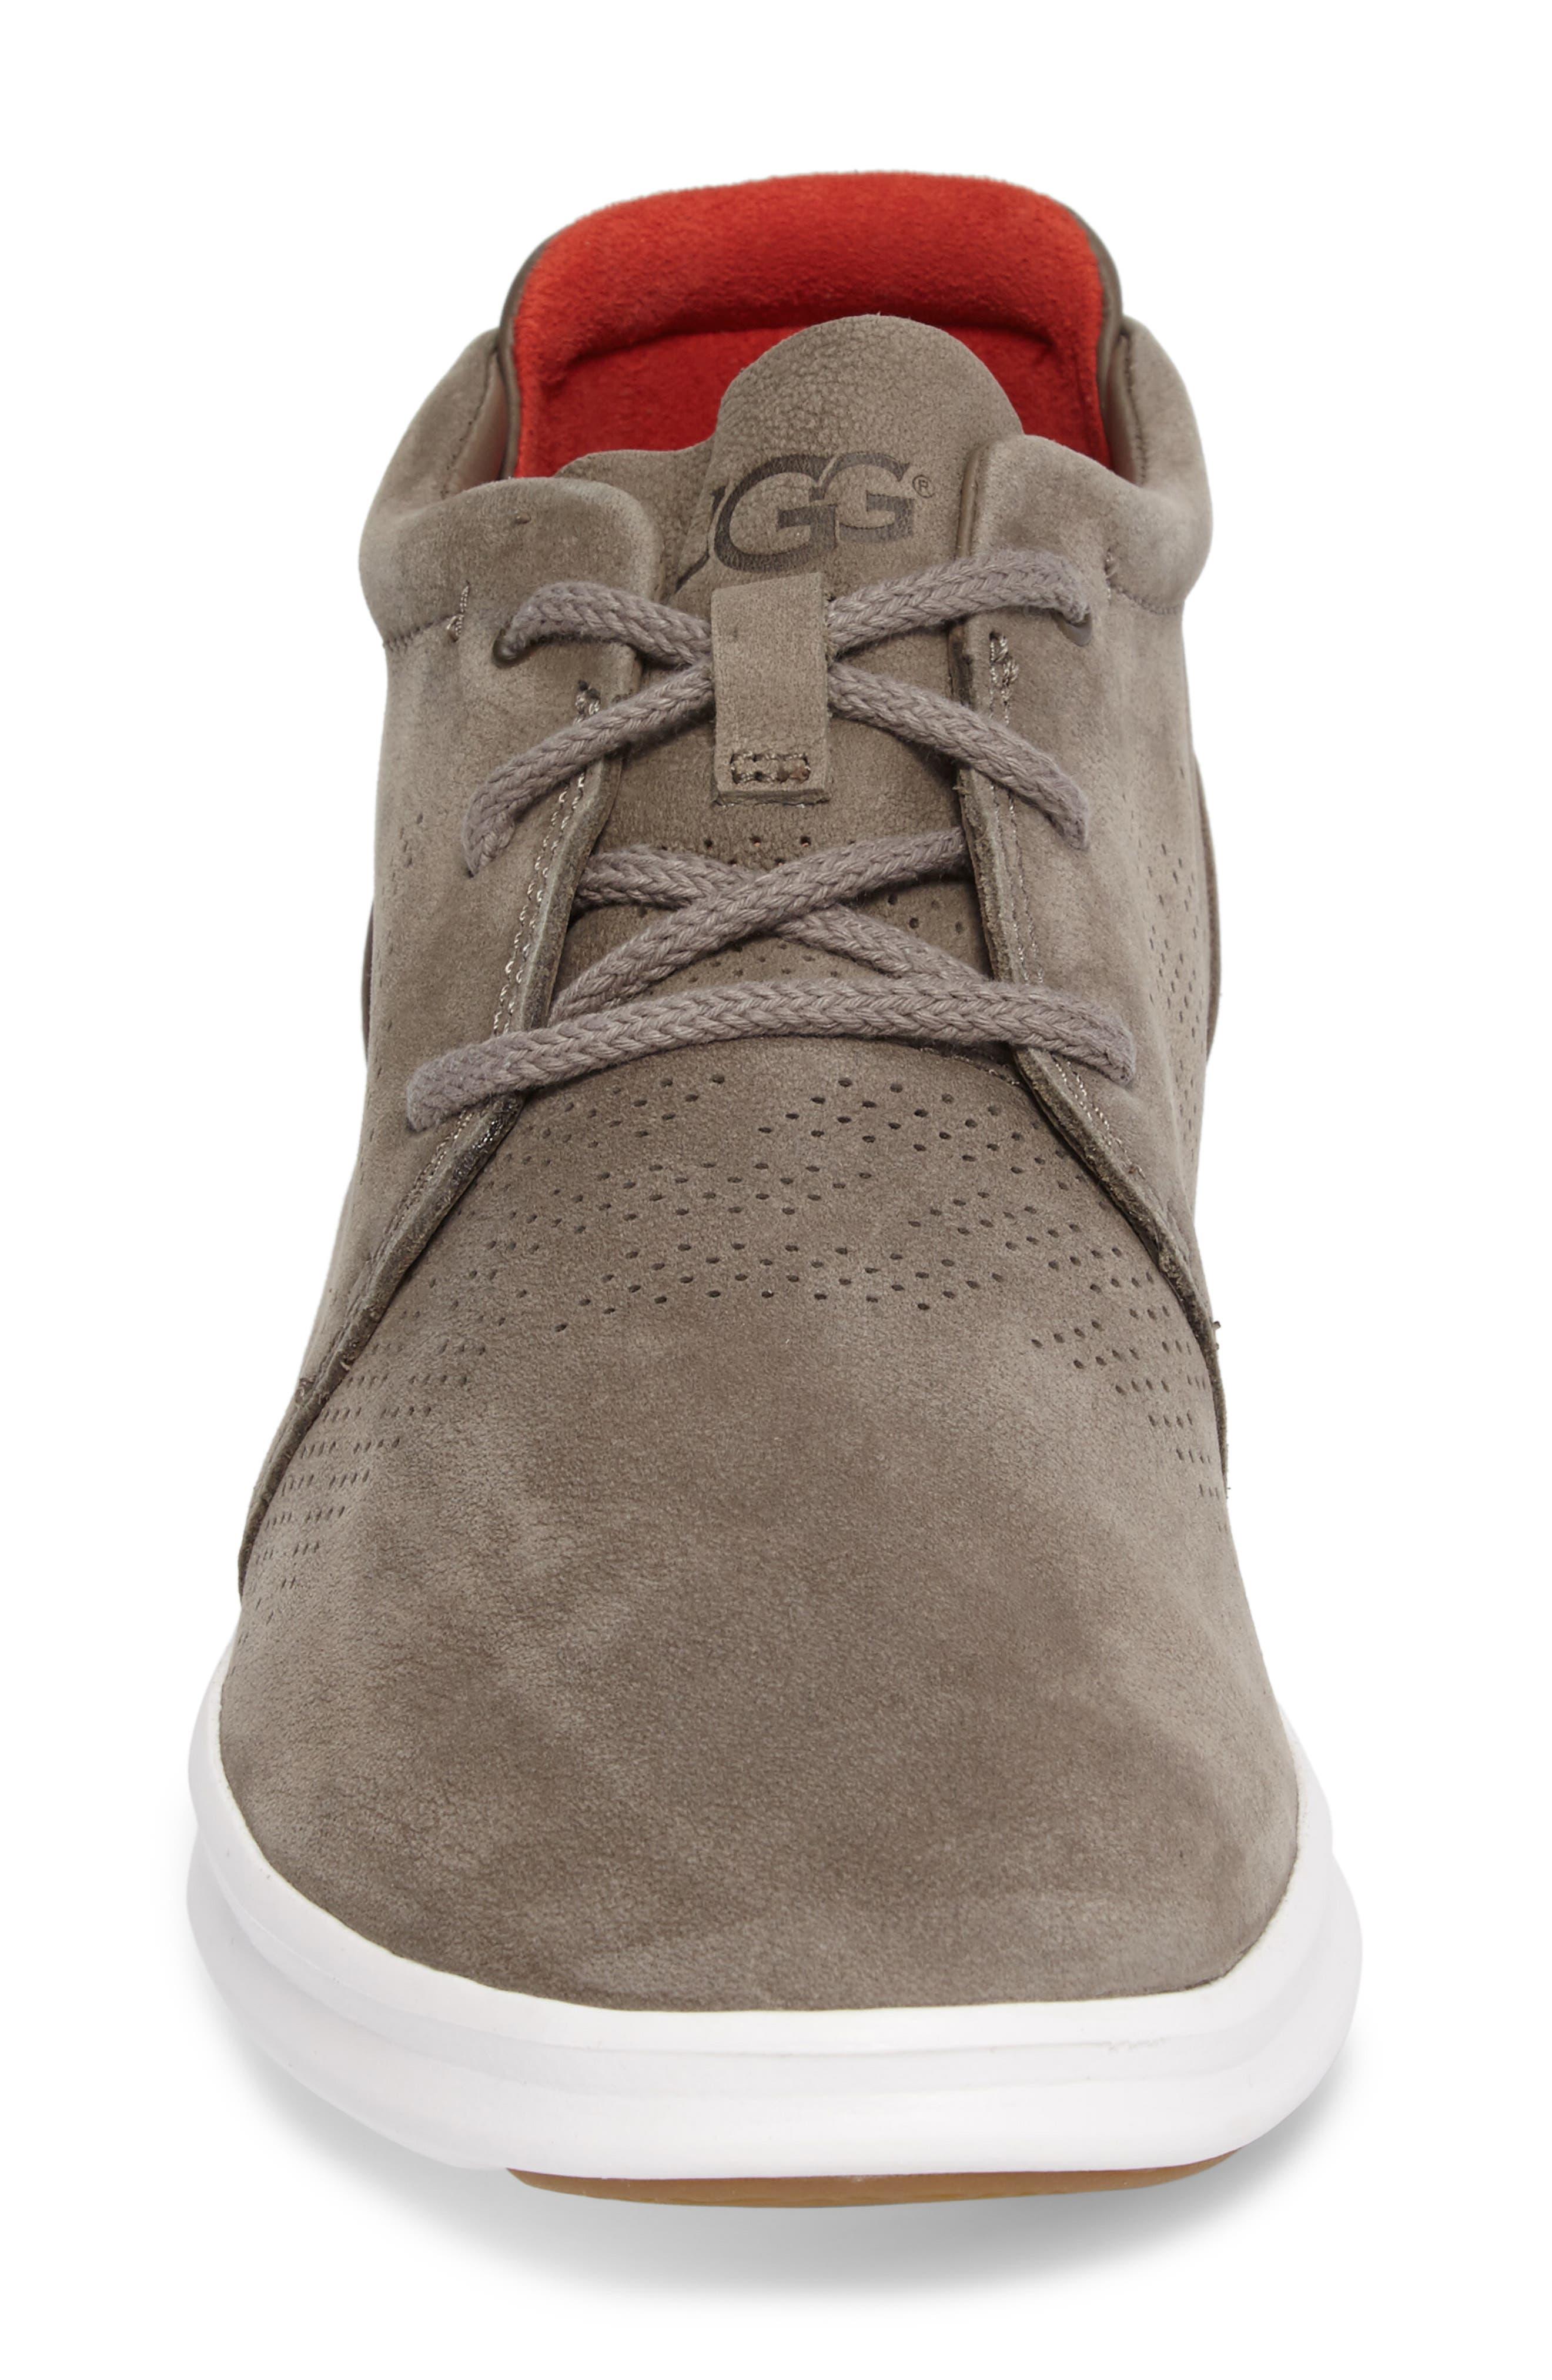 Larken Chukka Sneaker,                             Alternate thumbnail 4, color,                             Mole